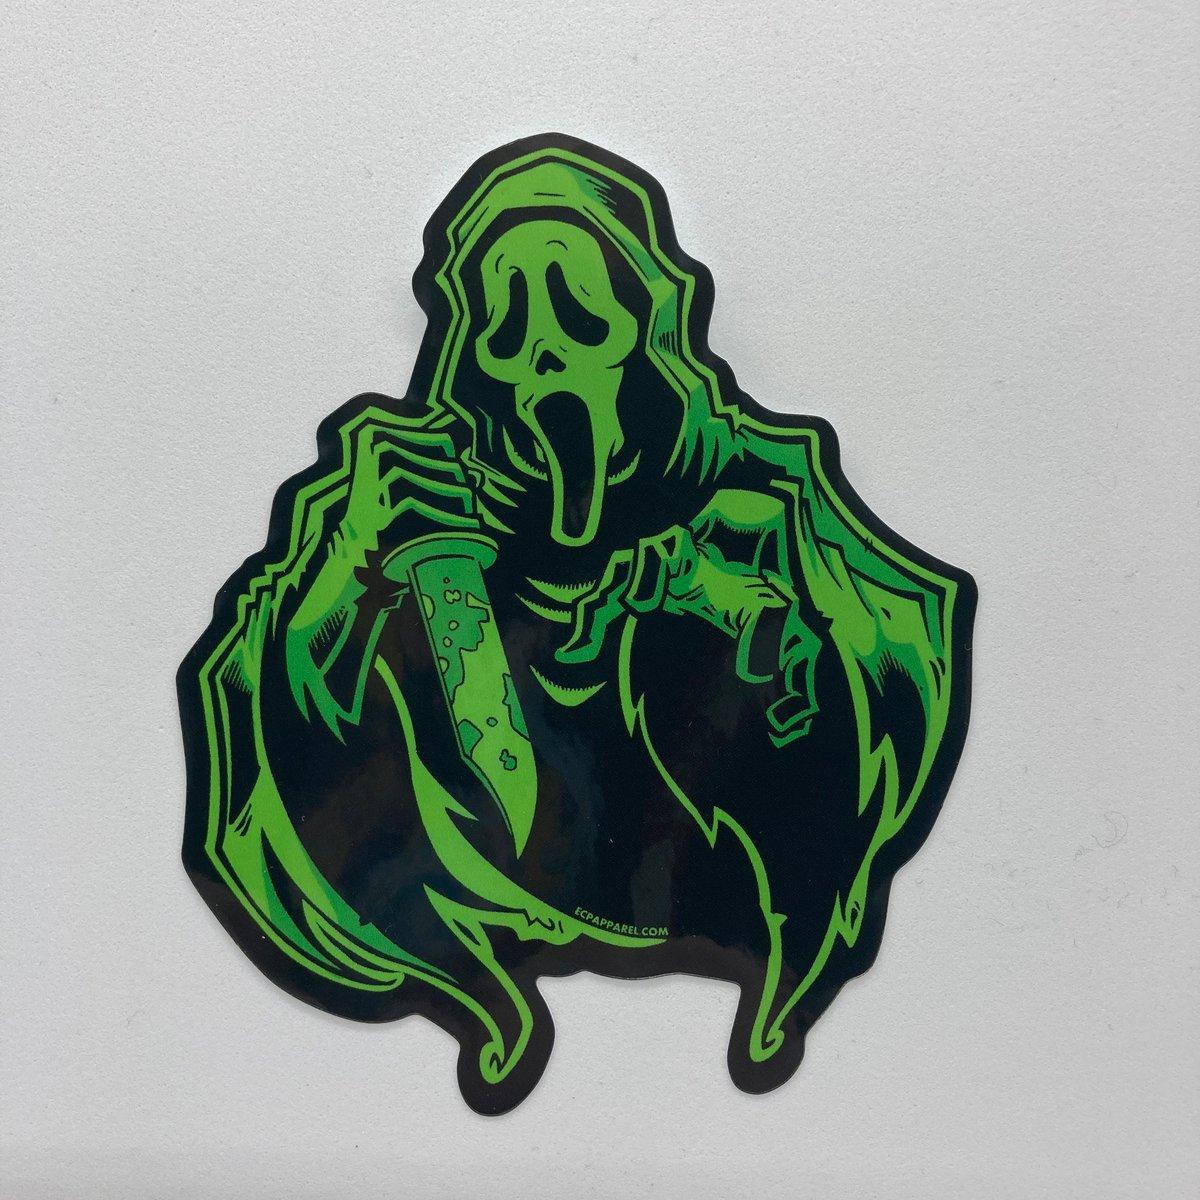 """Ghostface Stab"" Die-cut Sticker"